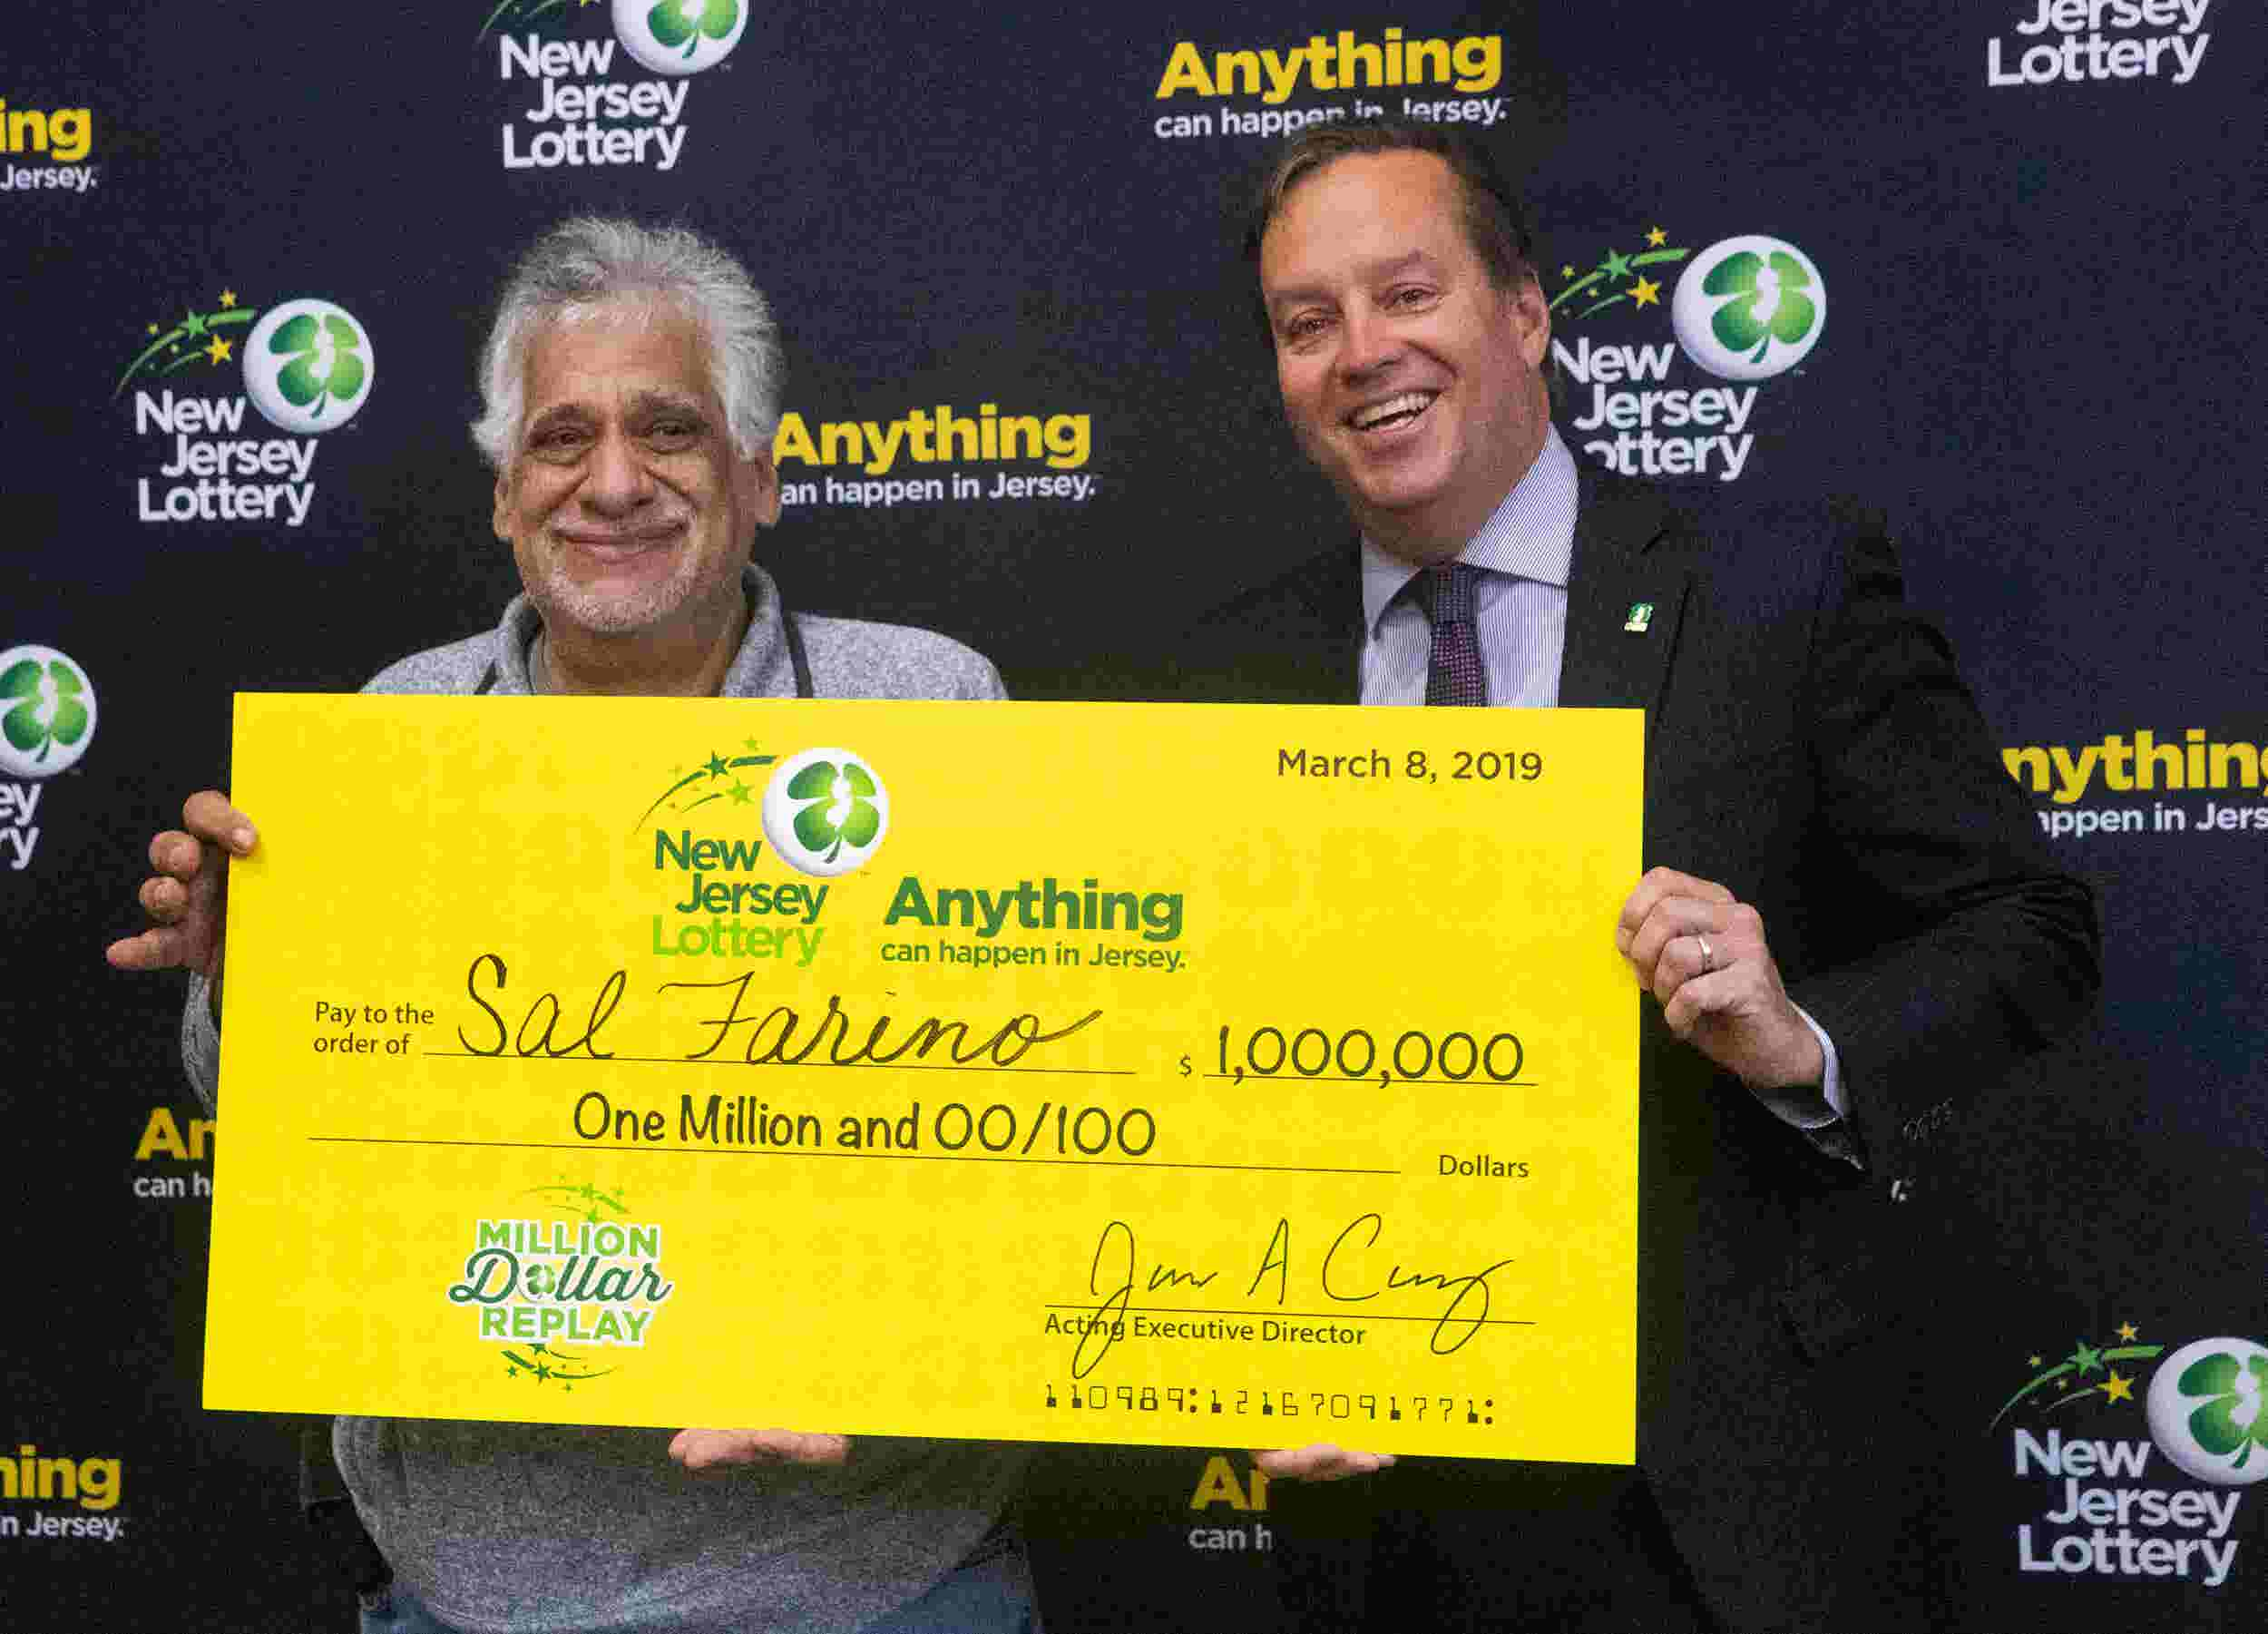 Nj Lottery Picks Lucky 1 Million Winner In Asbury Park